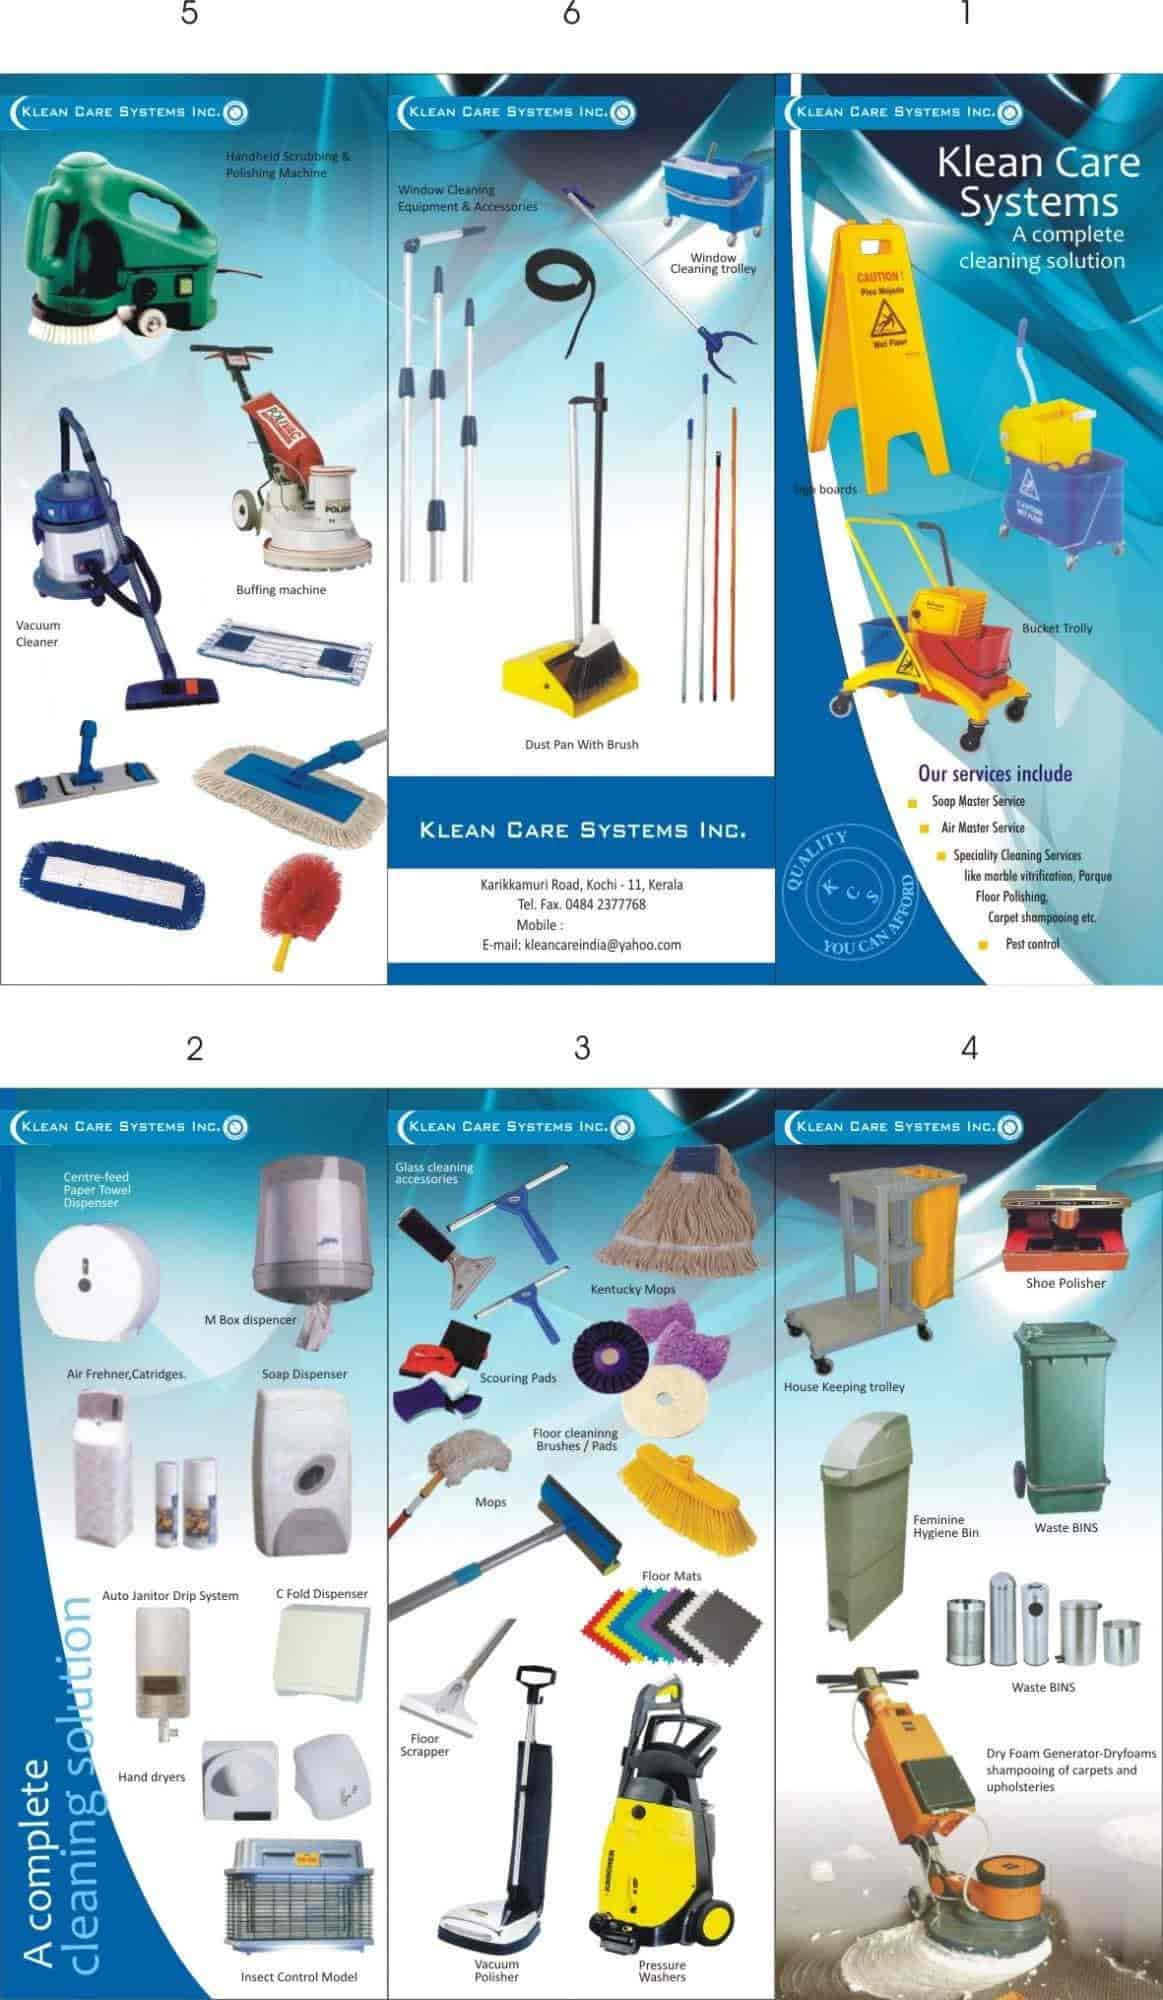 Kleancare Systems INC, Femco Traders - Plastic Tape